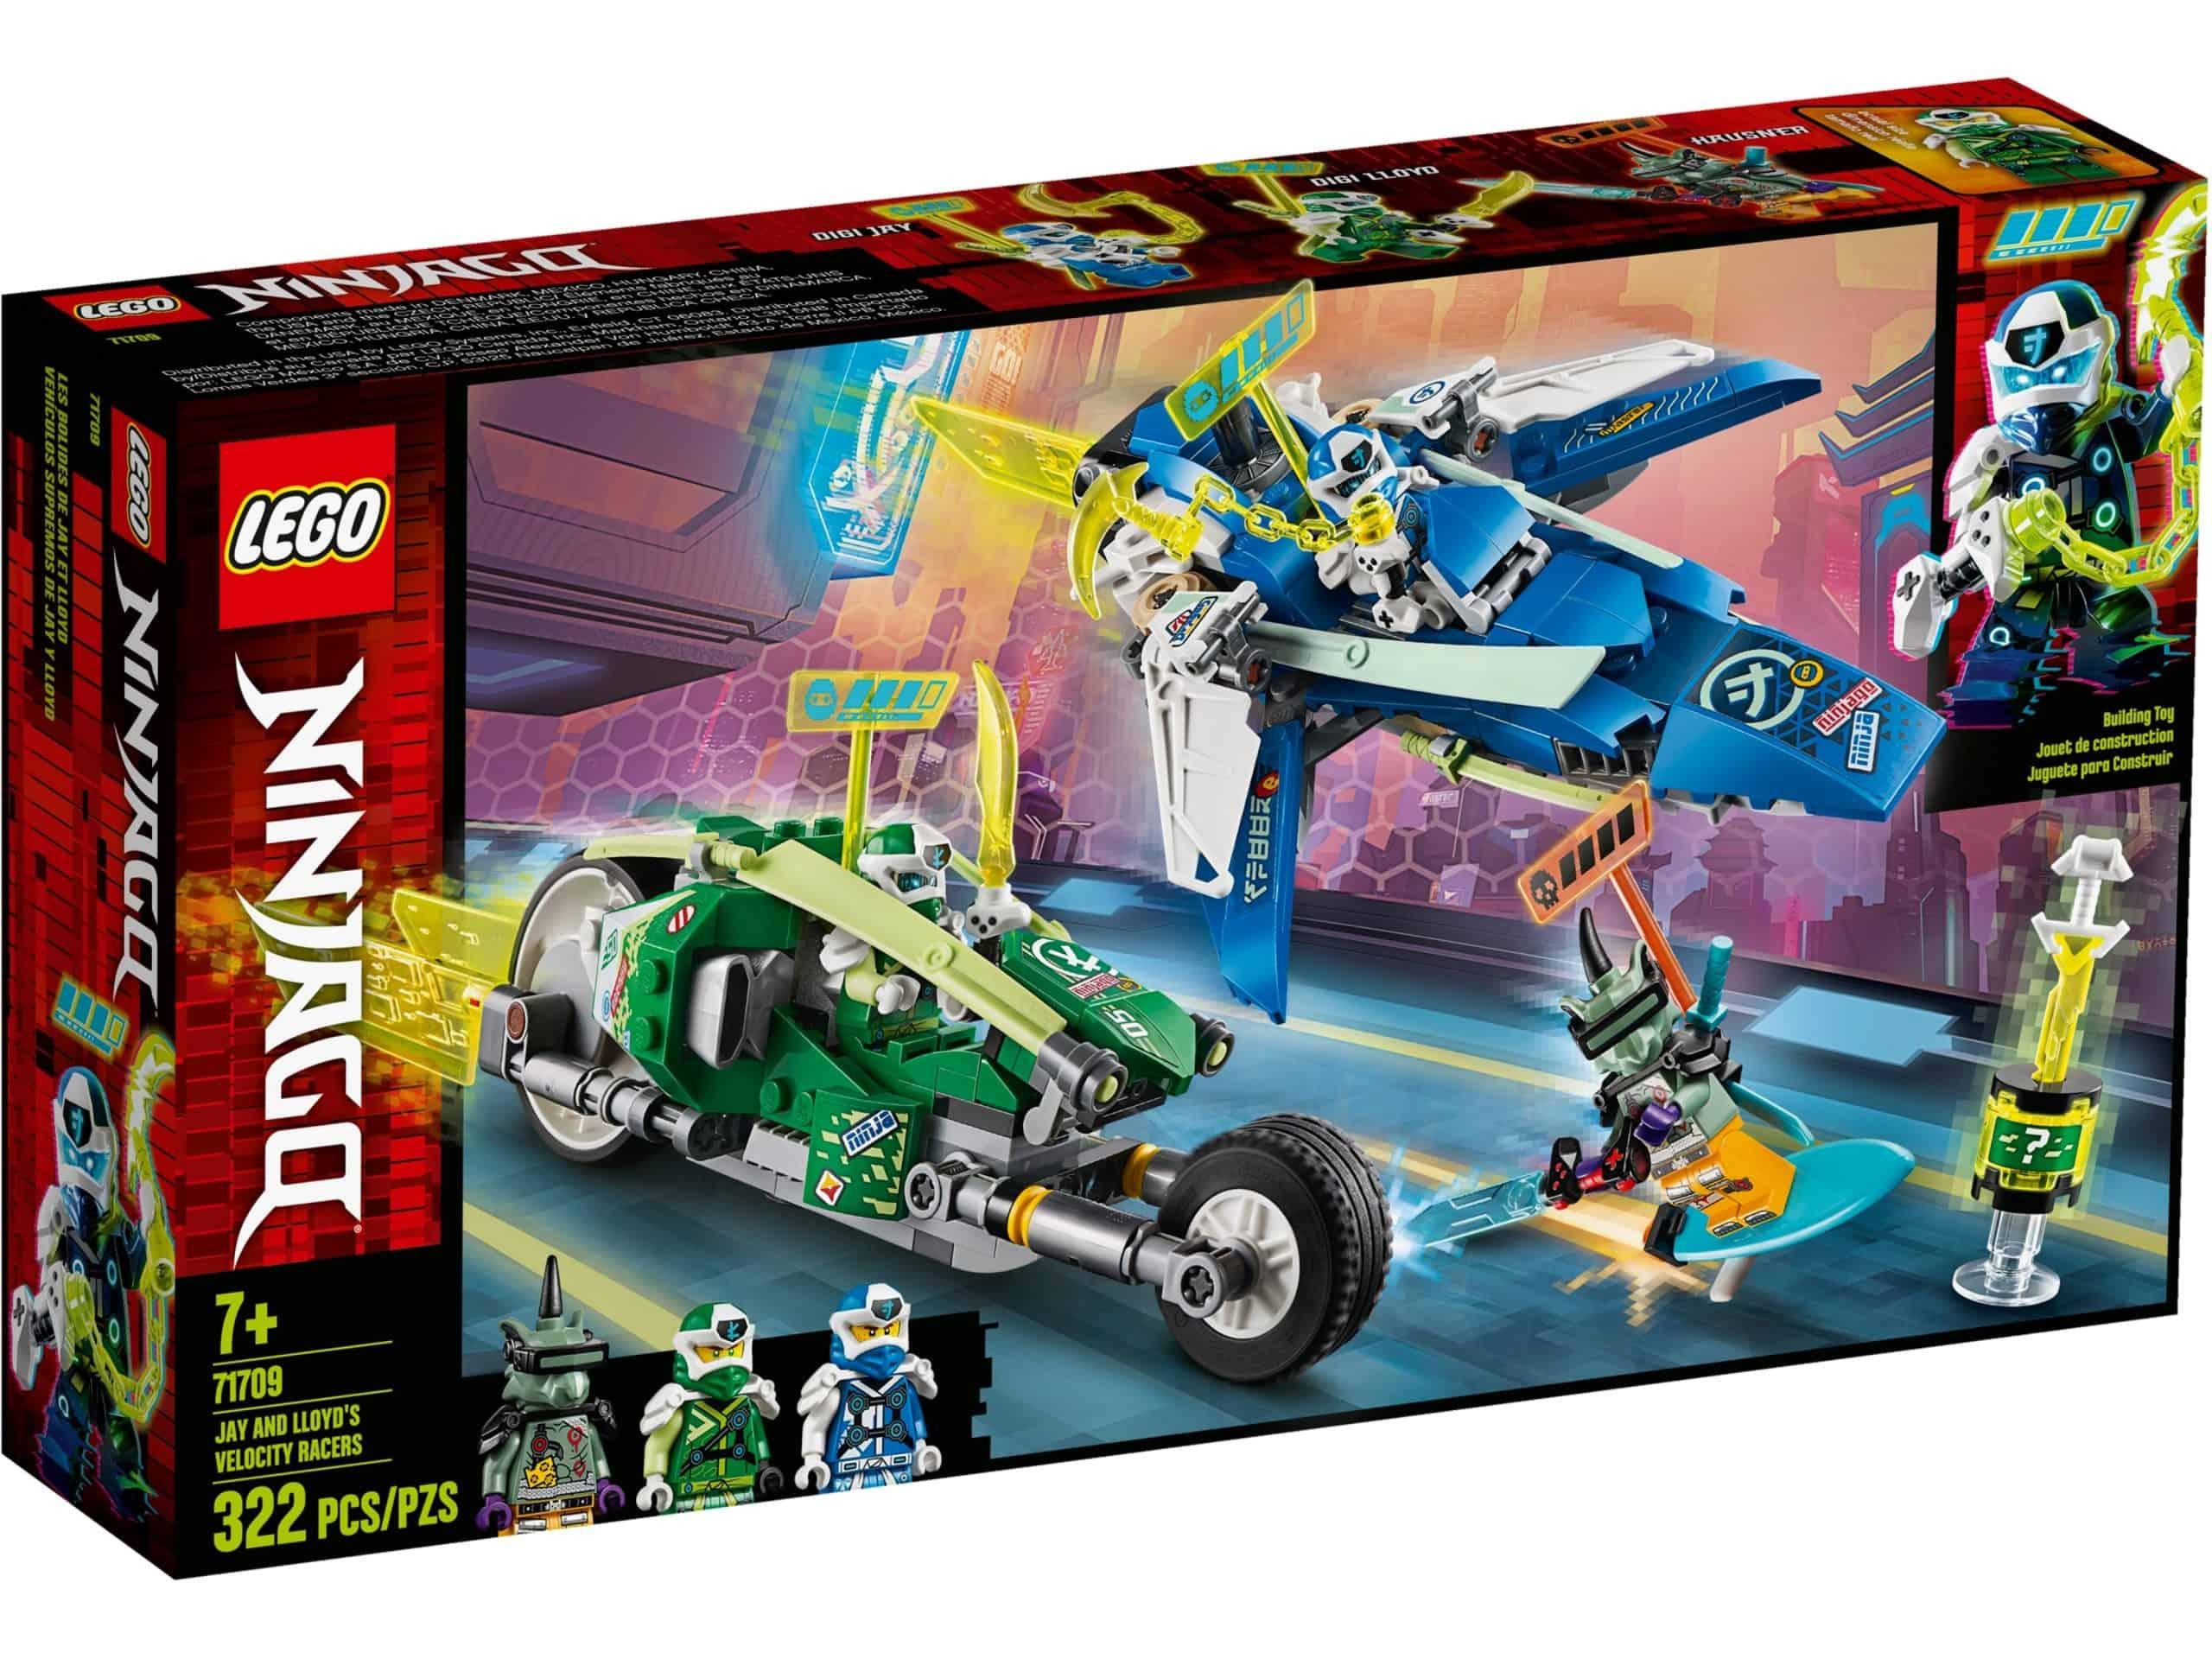 lego 71709 jay og lloyds superhurtige racere scaled